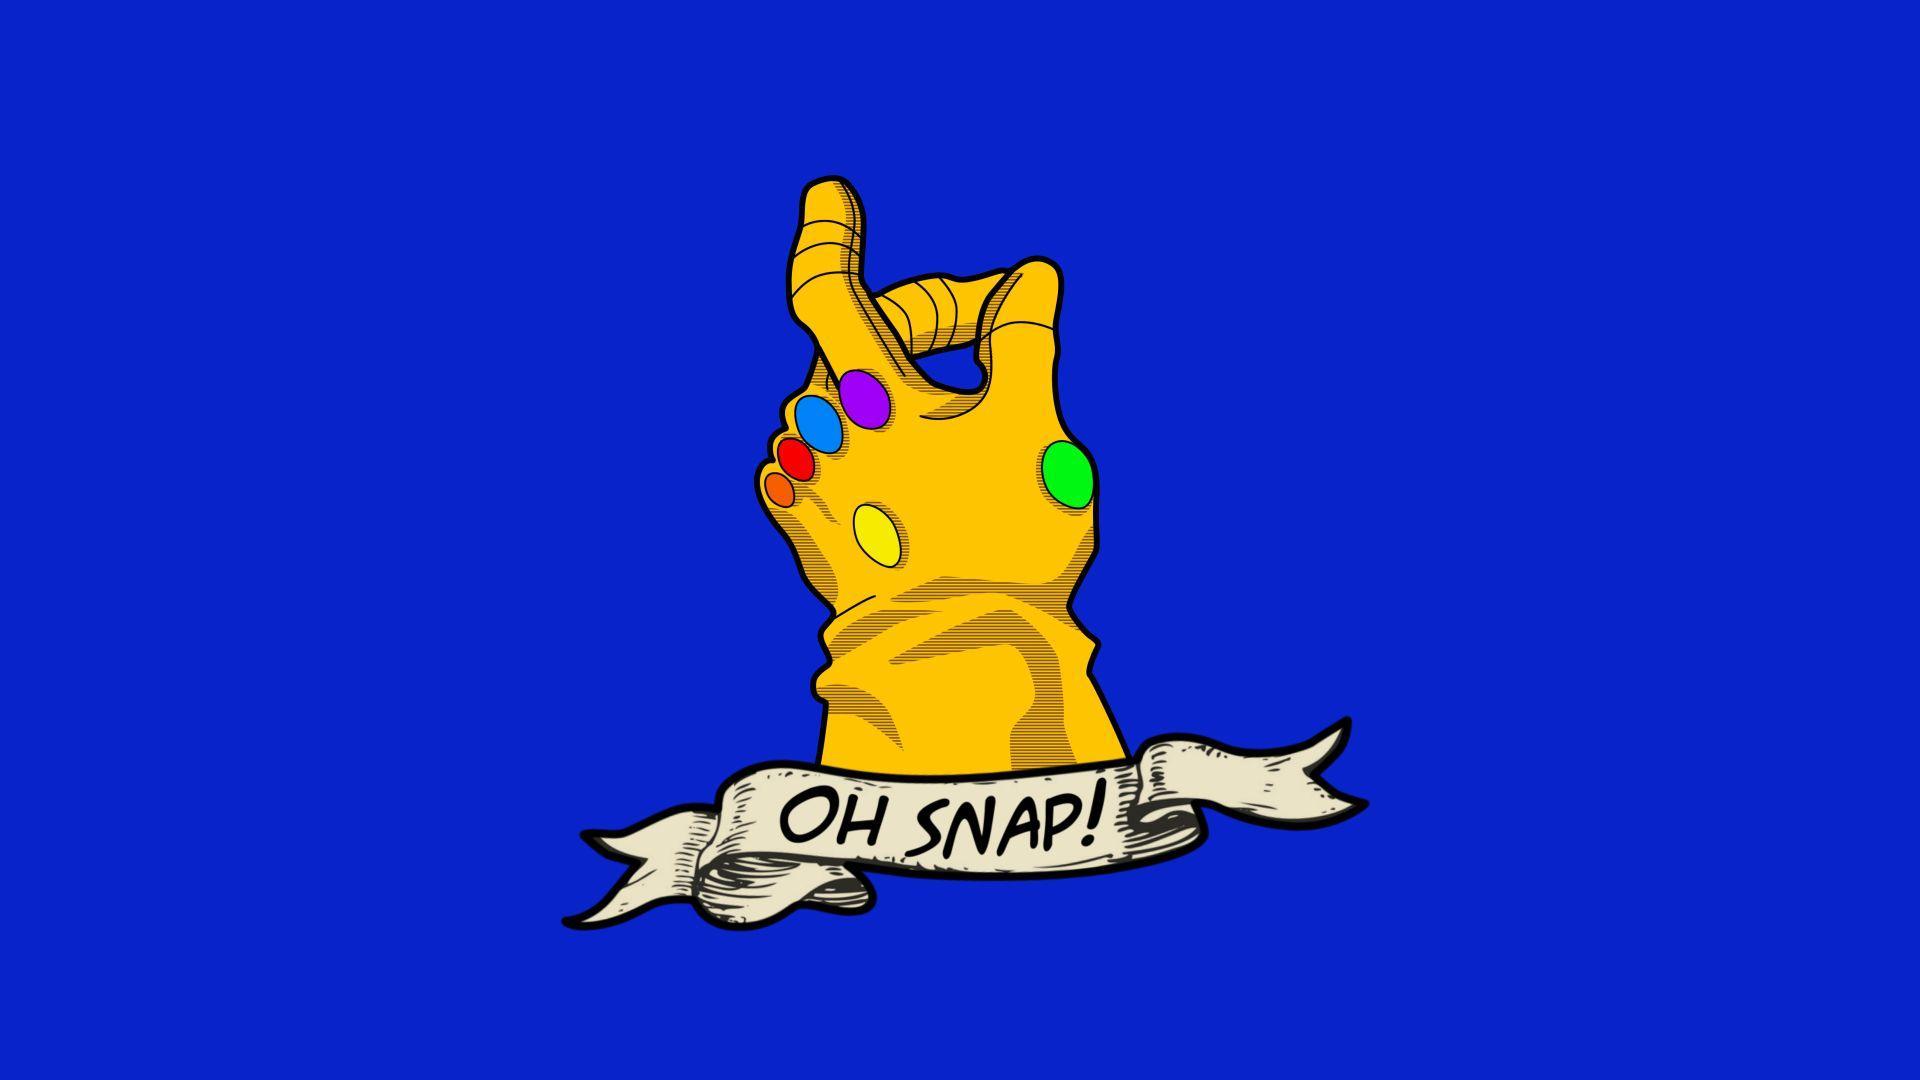 6b77a4948 1920x1080 Fan Art: OC] Thanos OH SNAP! Infinity Gauntlet Tattoo T-shirt